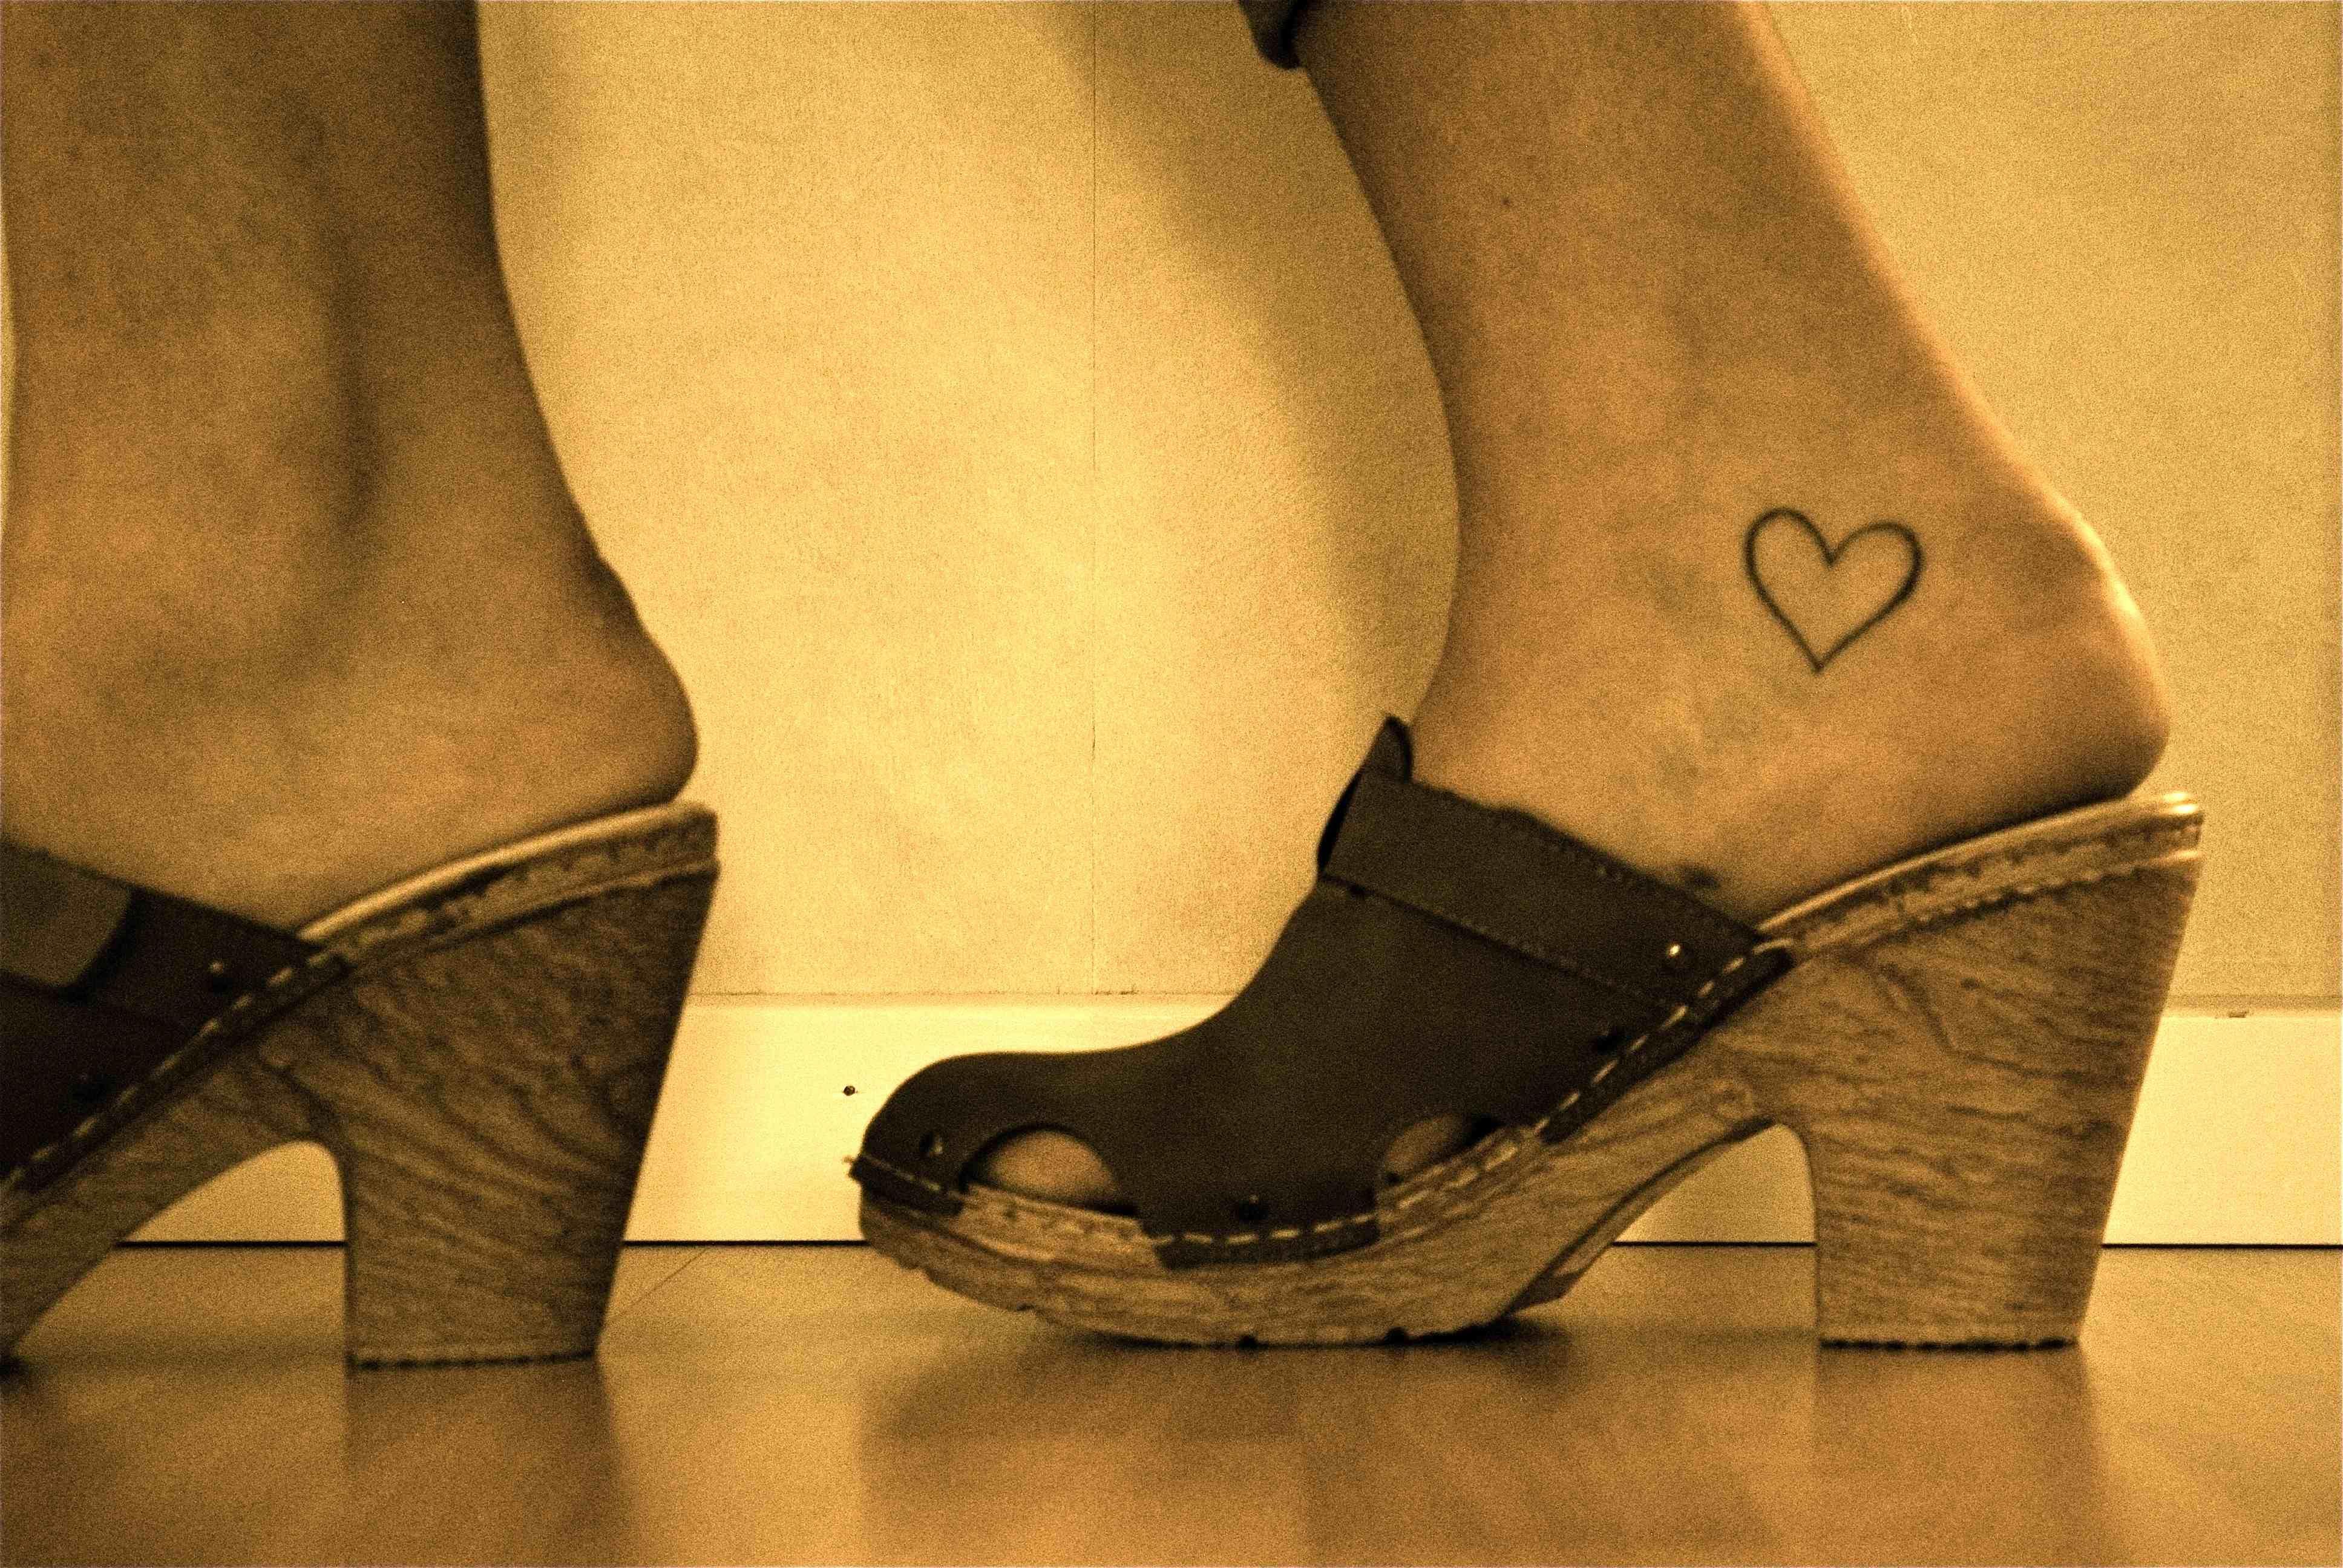 Tattoo ideas for men names heart foot tattoo designs  cute tattoos  pinterest  heart foot